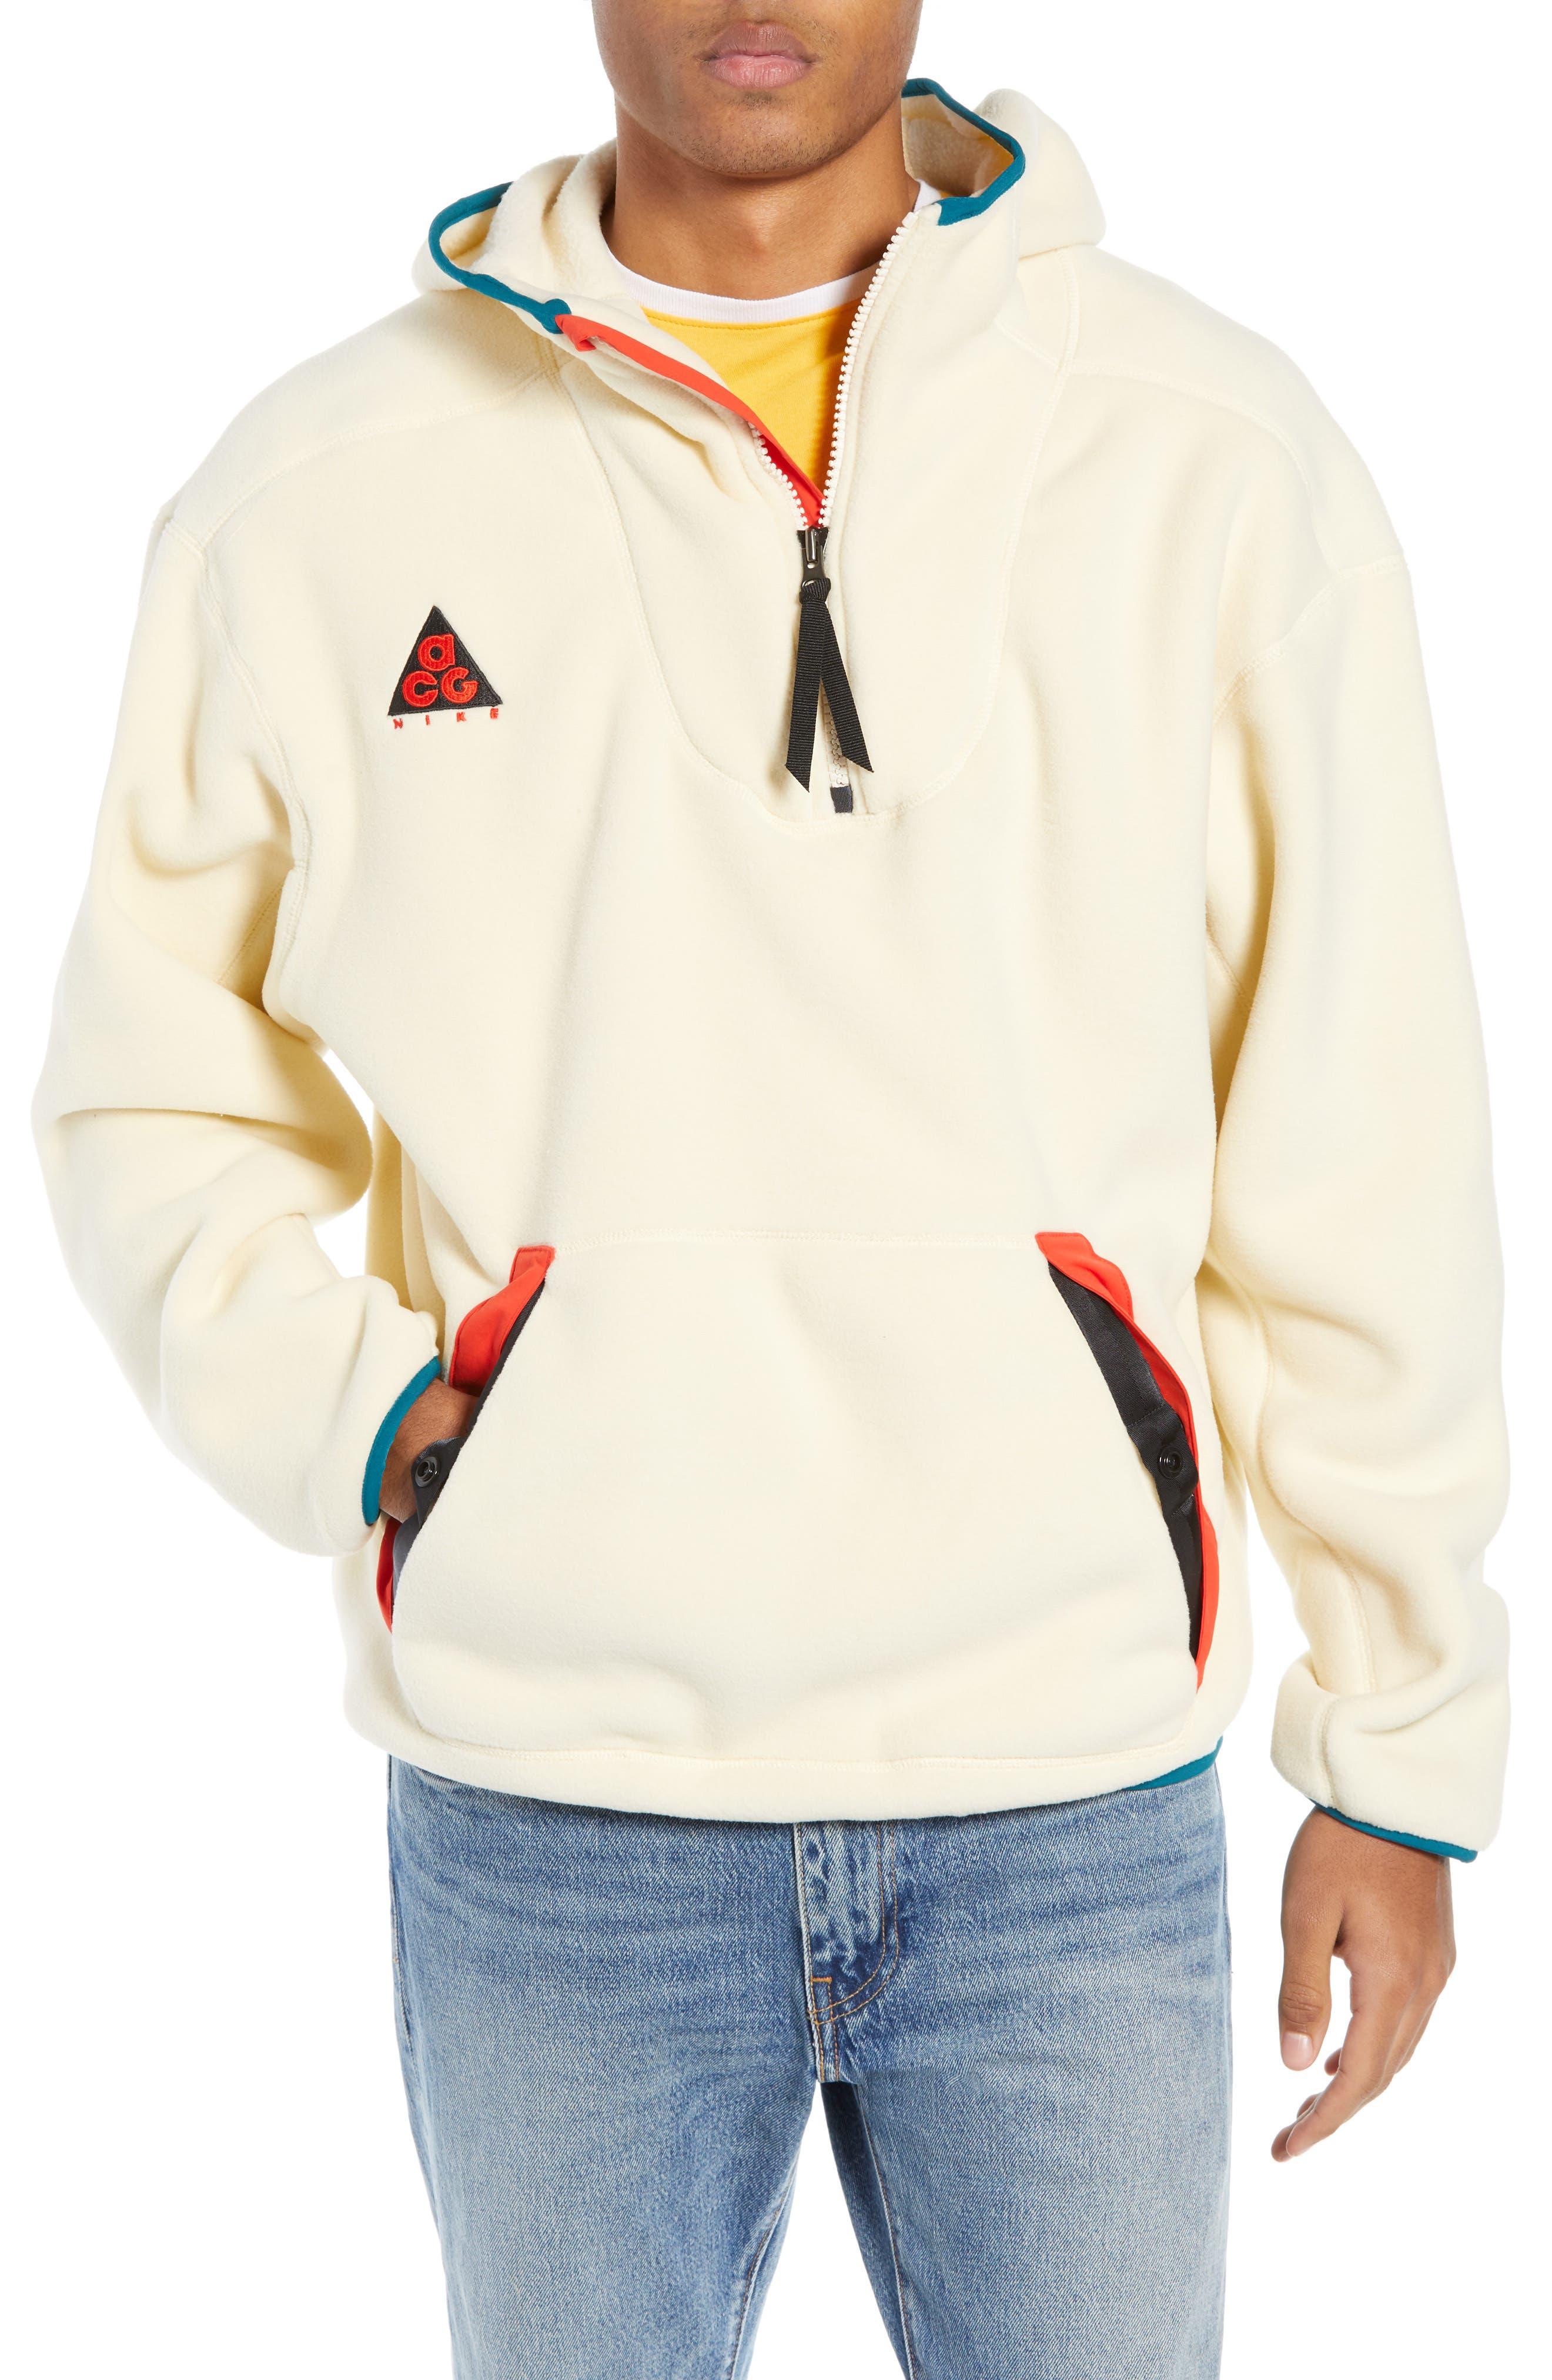 NIKE ACG Men's Fleece Hoodie, Main, color, LIGHT CREAM